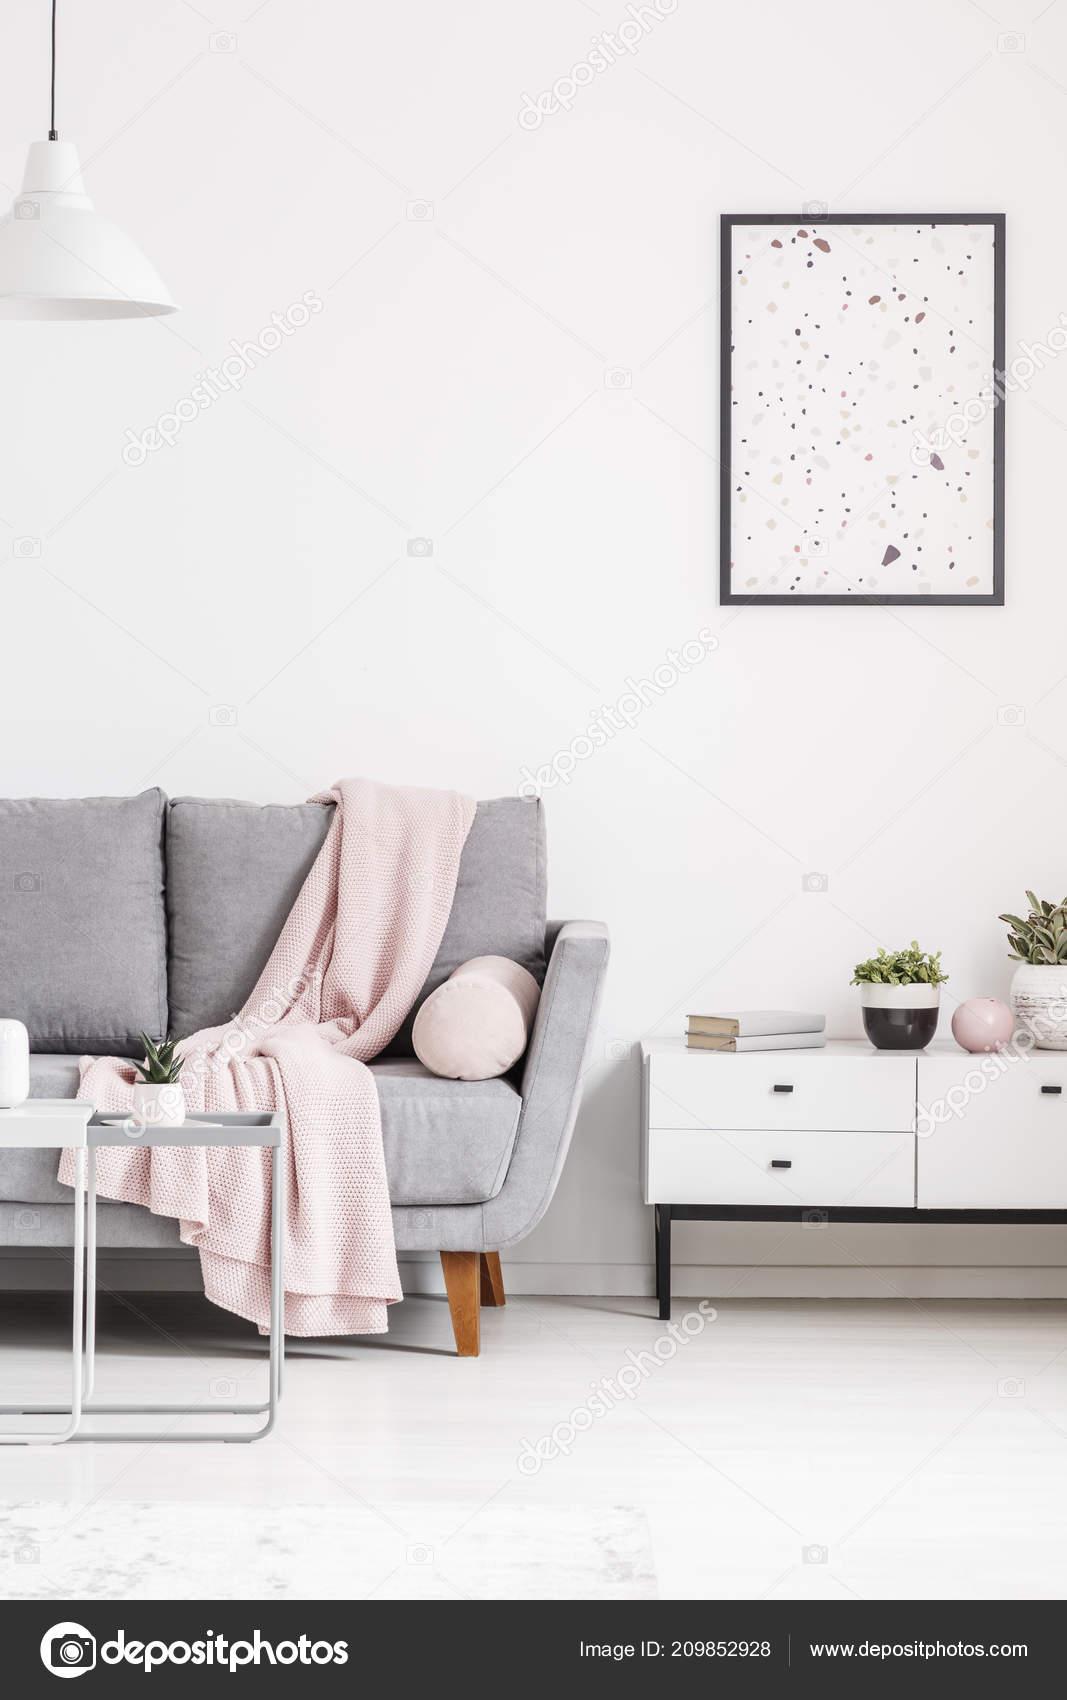 Modern Poster White Wall Grey Sofa Blanket Cabinet Living